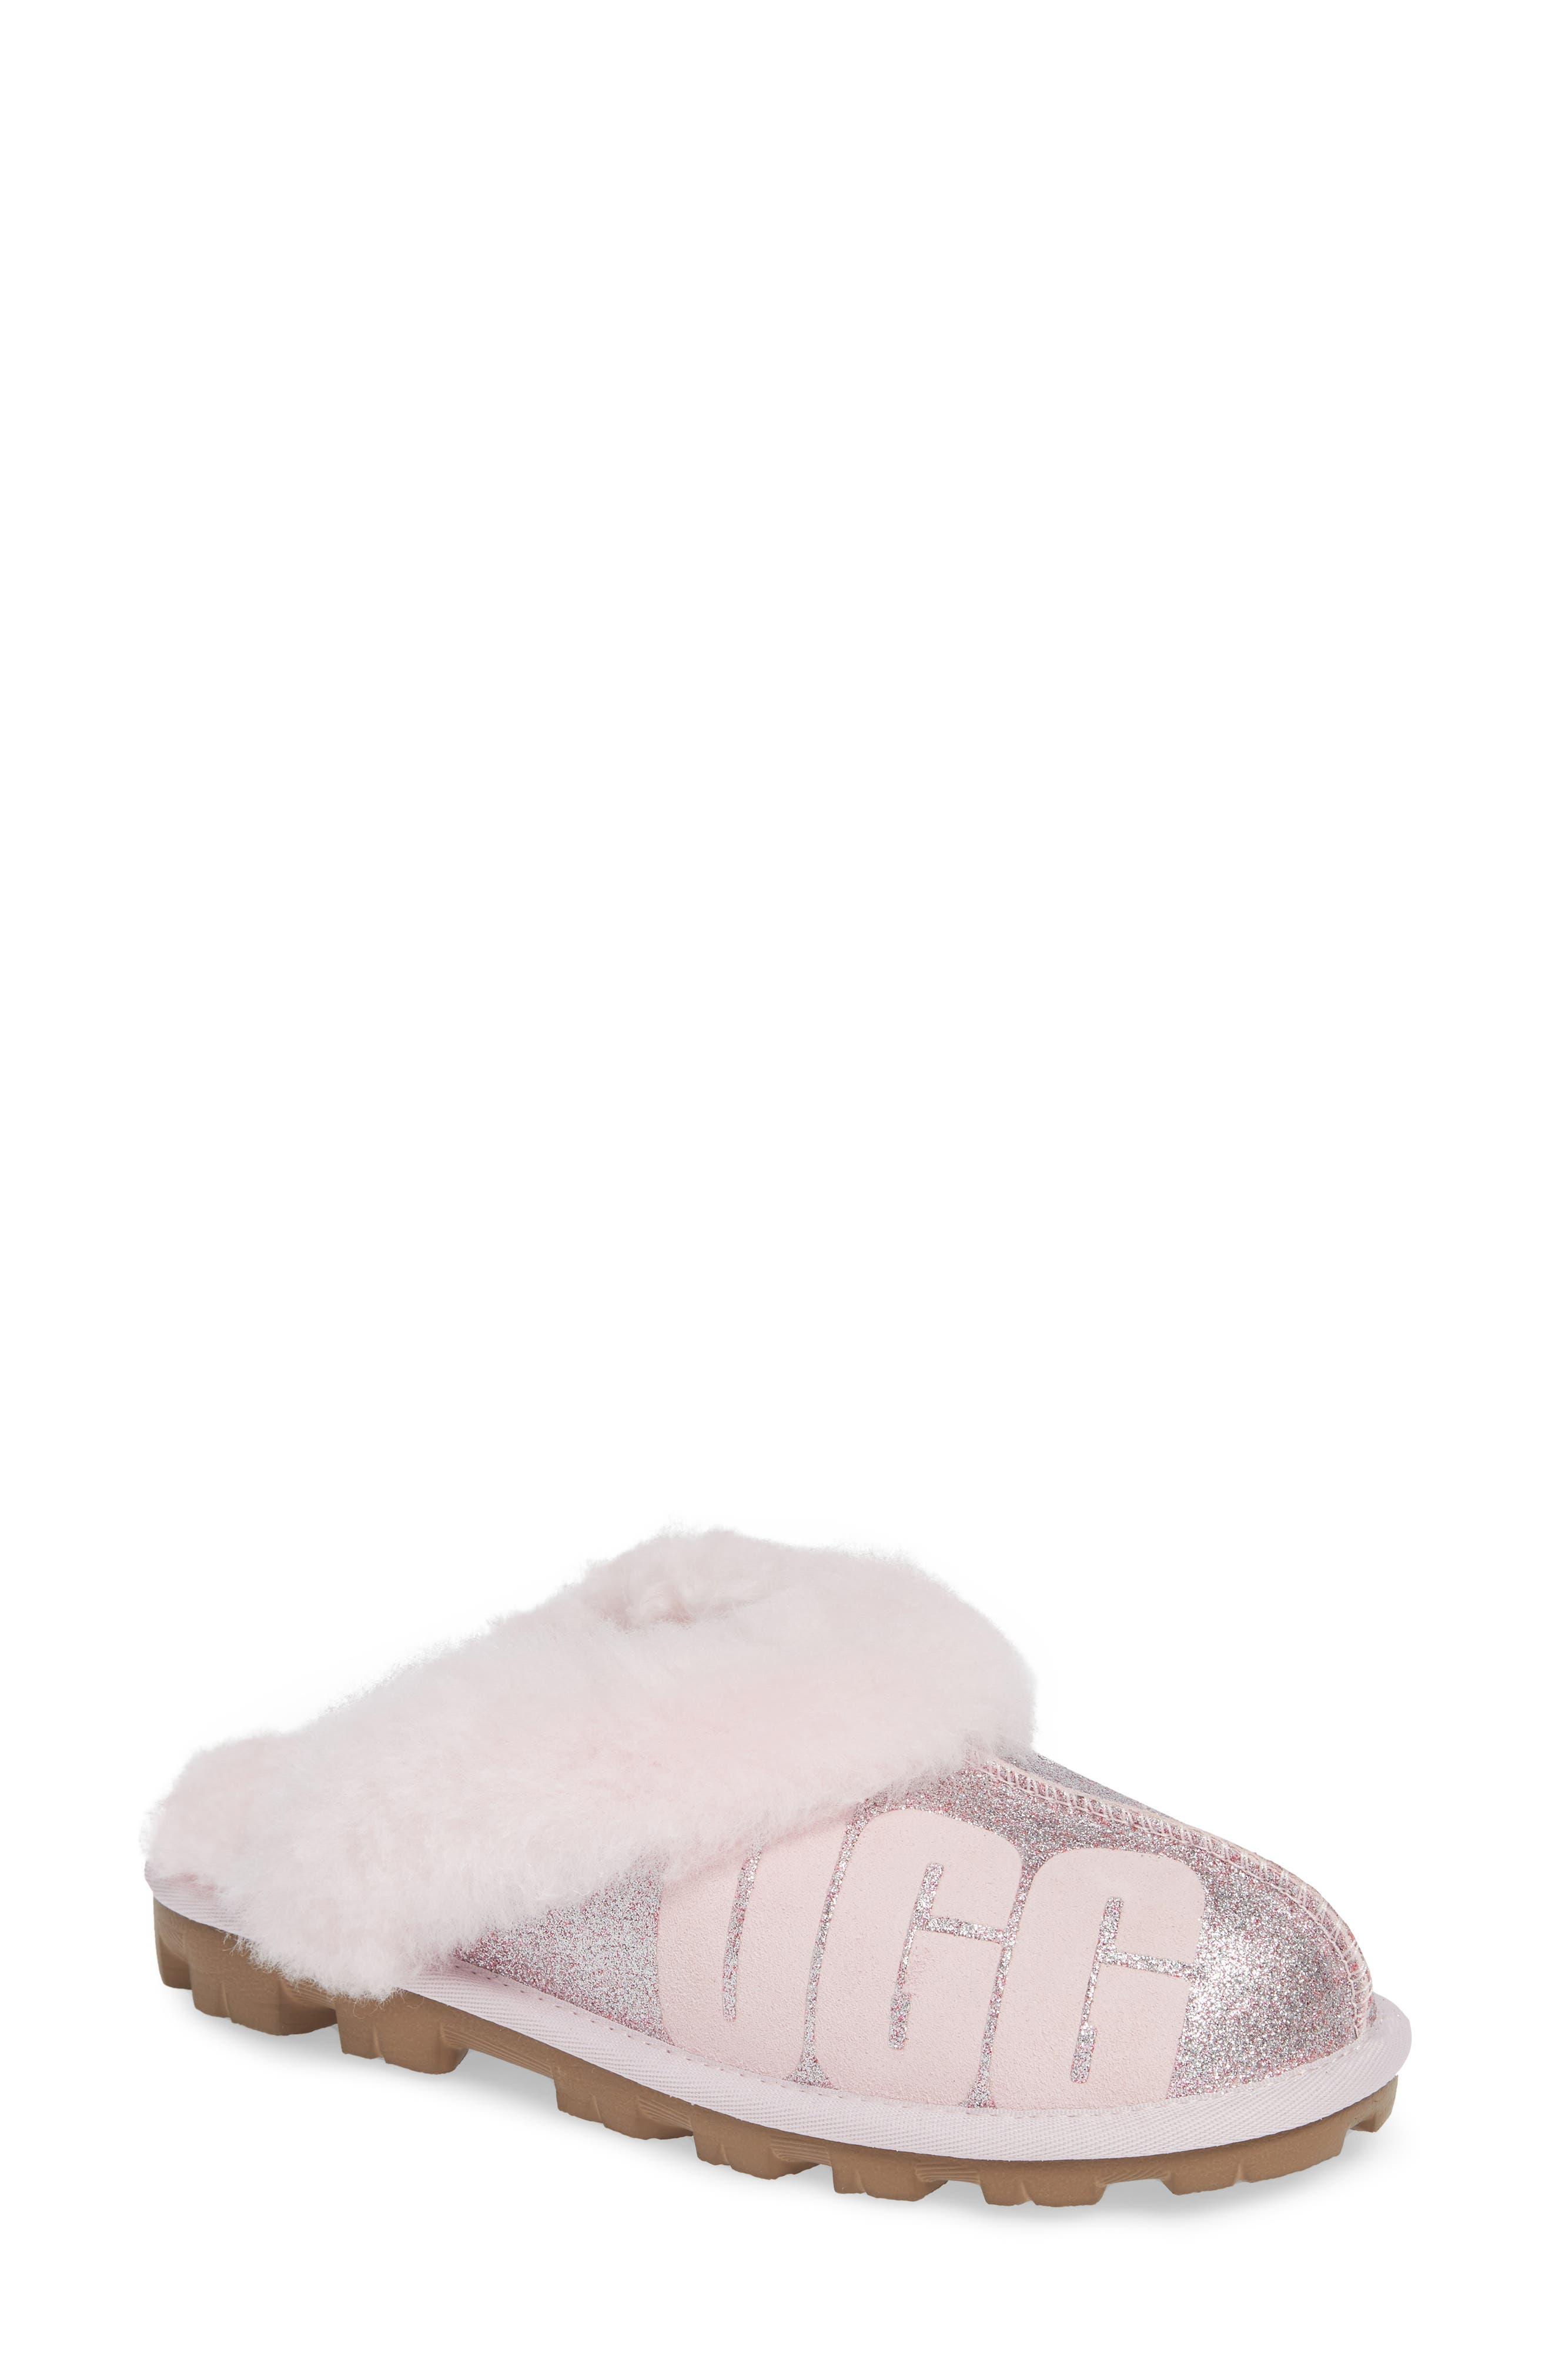 Ugg Sparkle Genuine Shearling Slipper